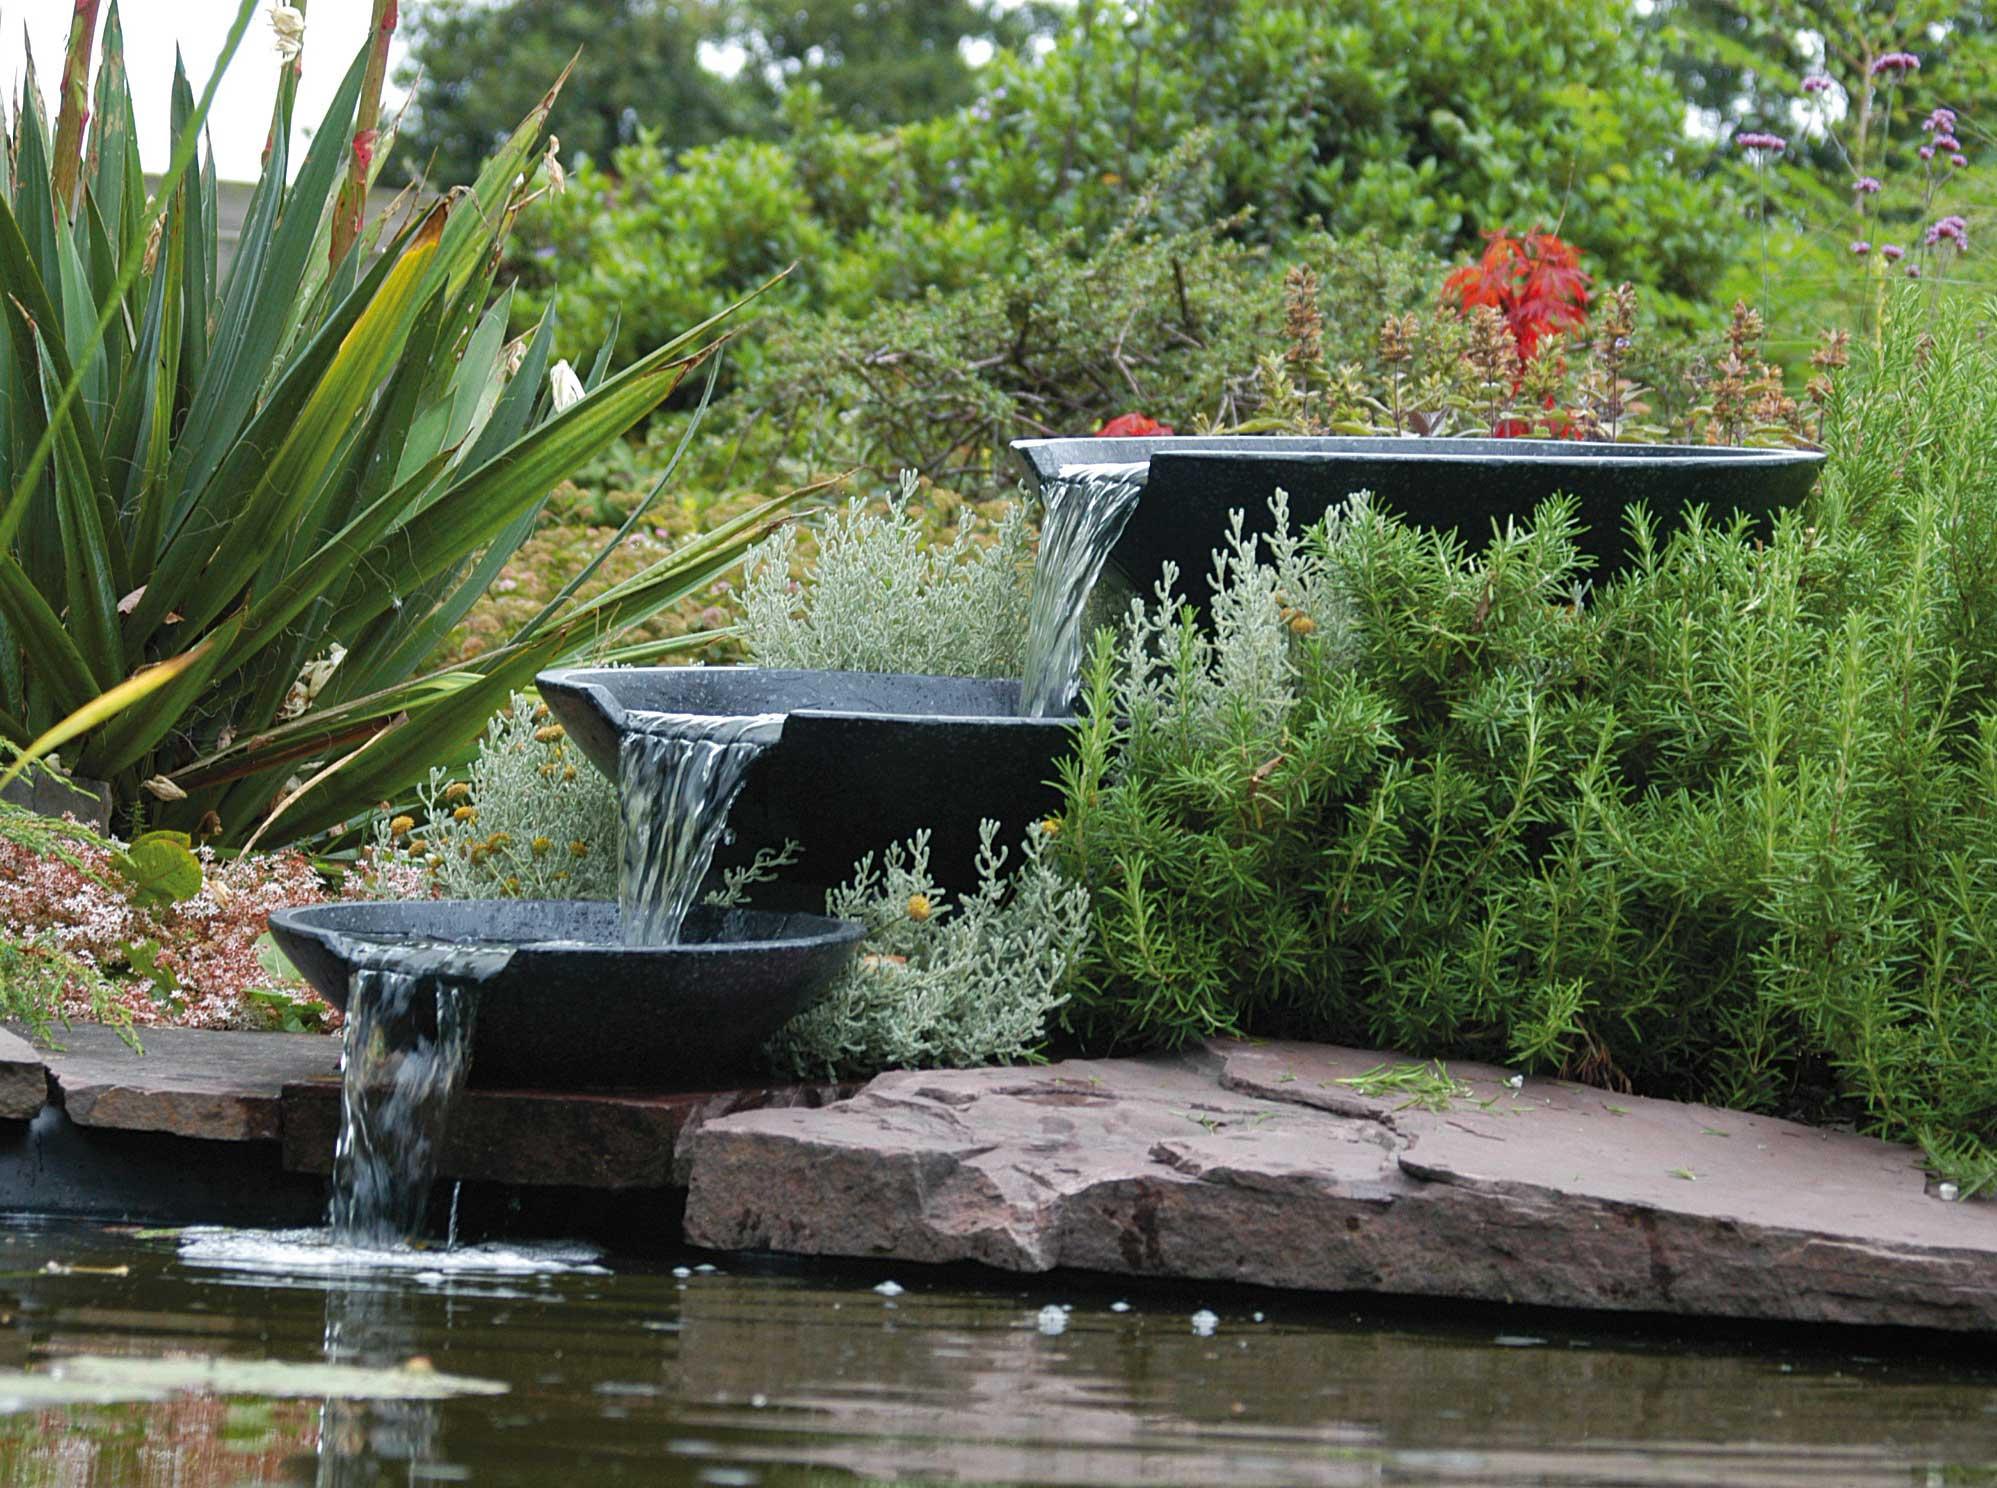 Gartenbrunnen / Wasserfall Ubbink AcquaArte Nova Scotia anthrazit Bild 1